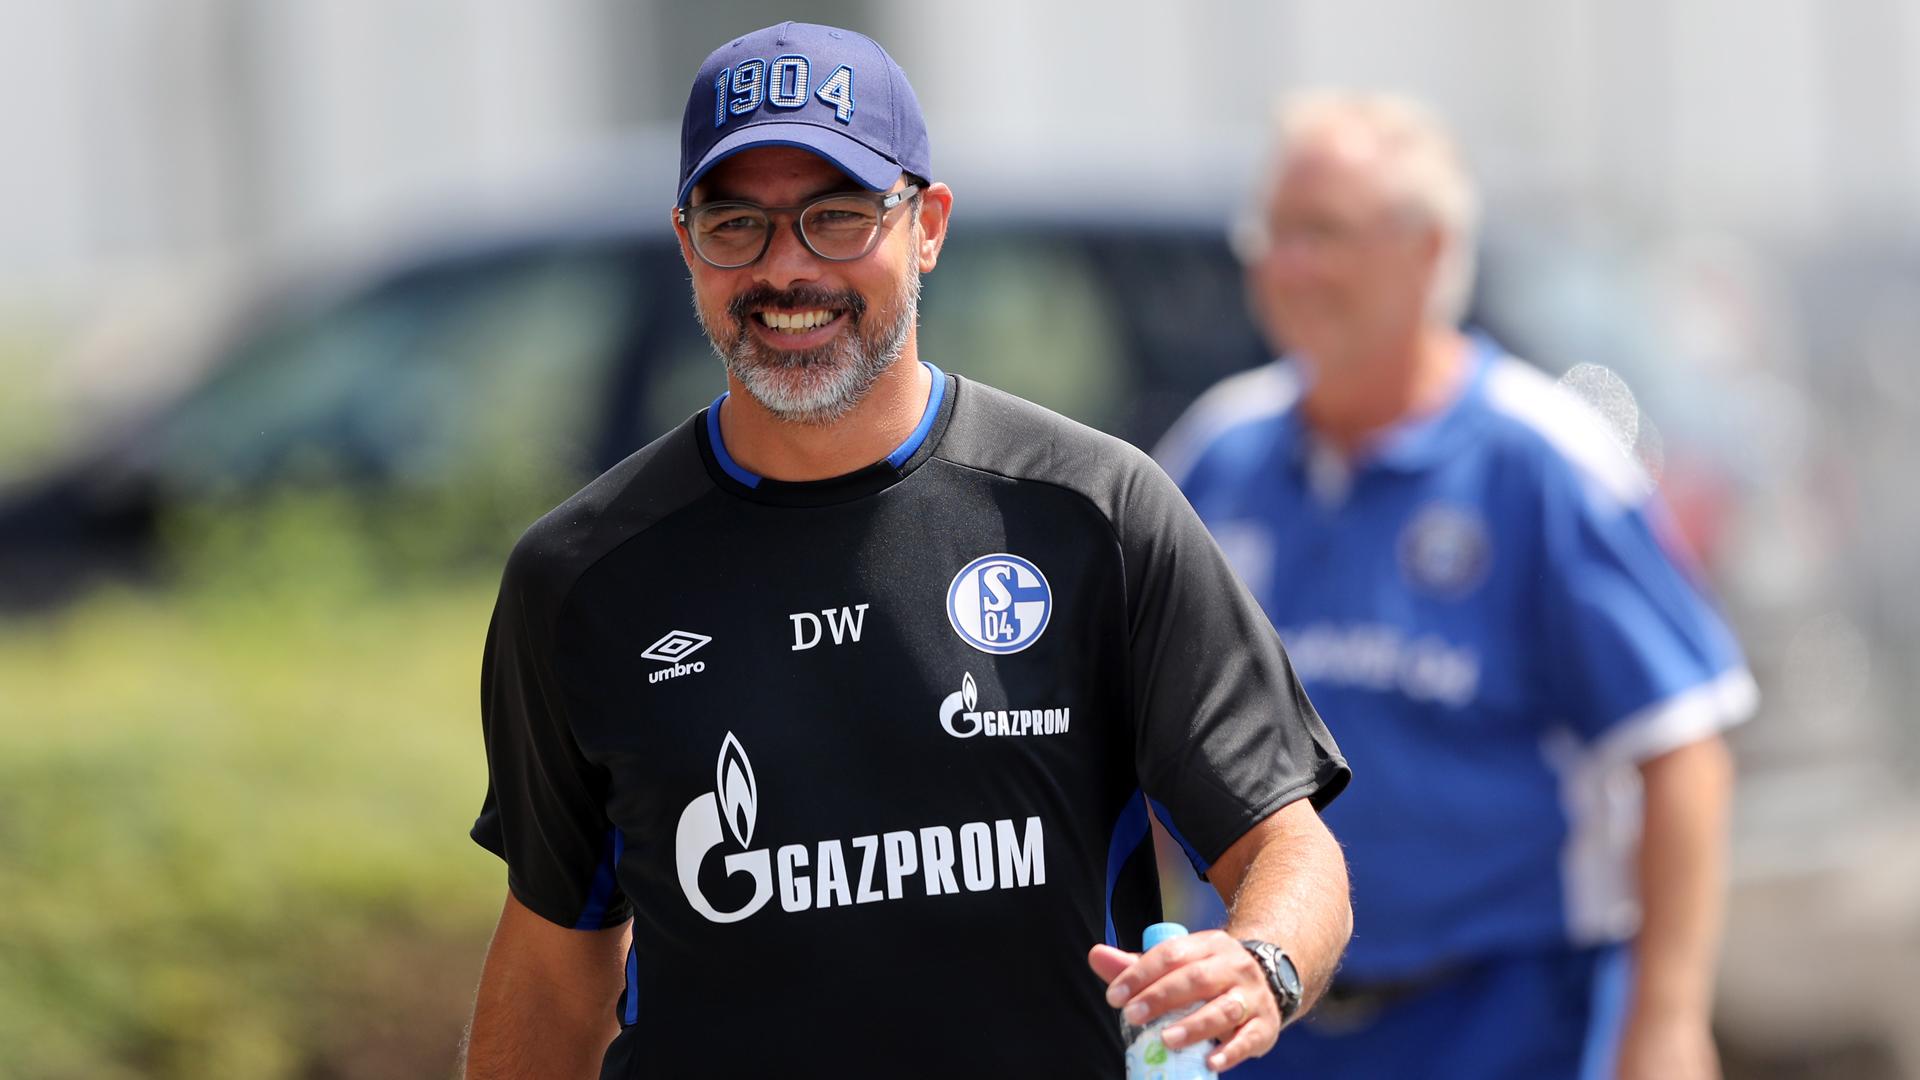 David Wagner FC Schalke 04 Bundesliga